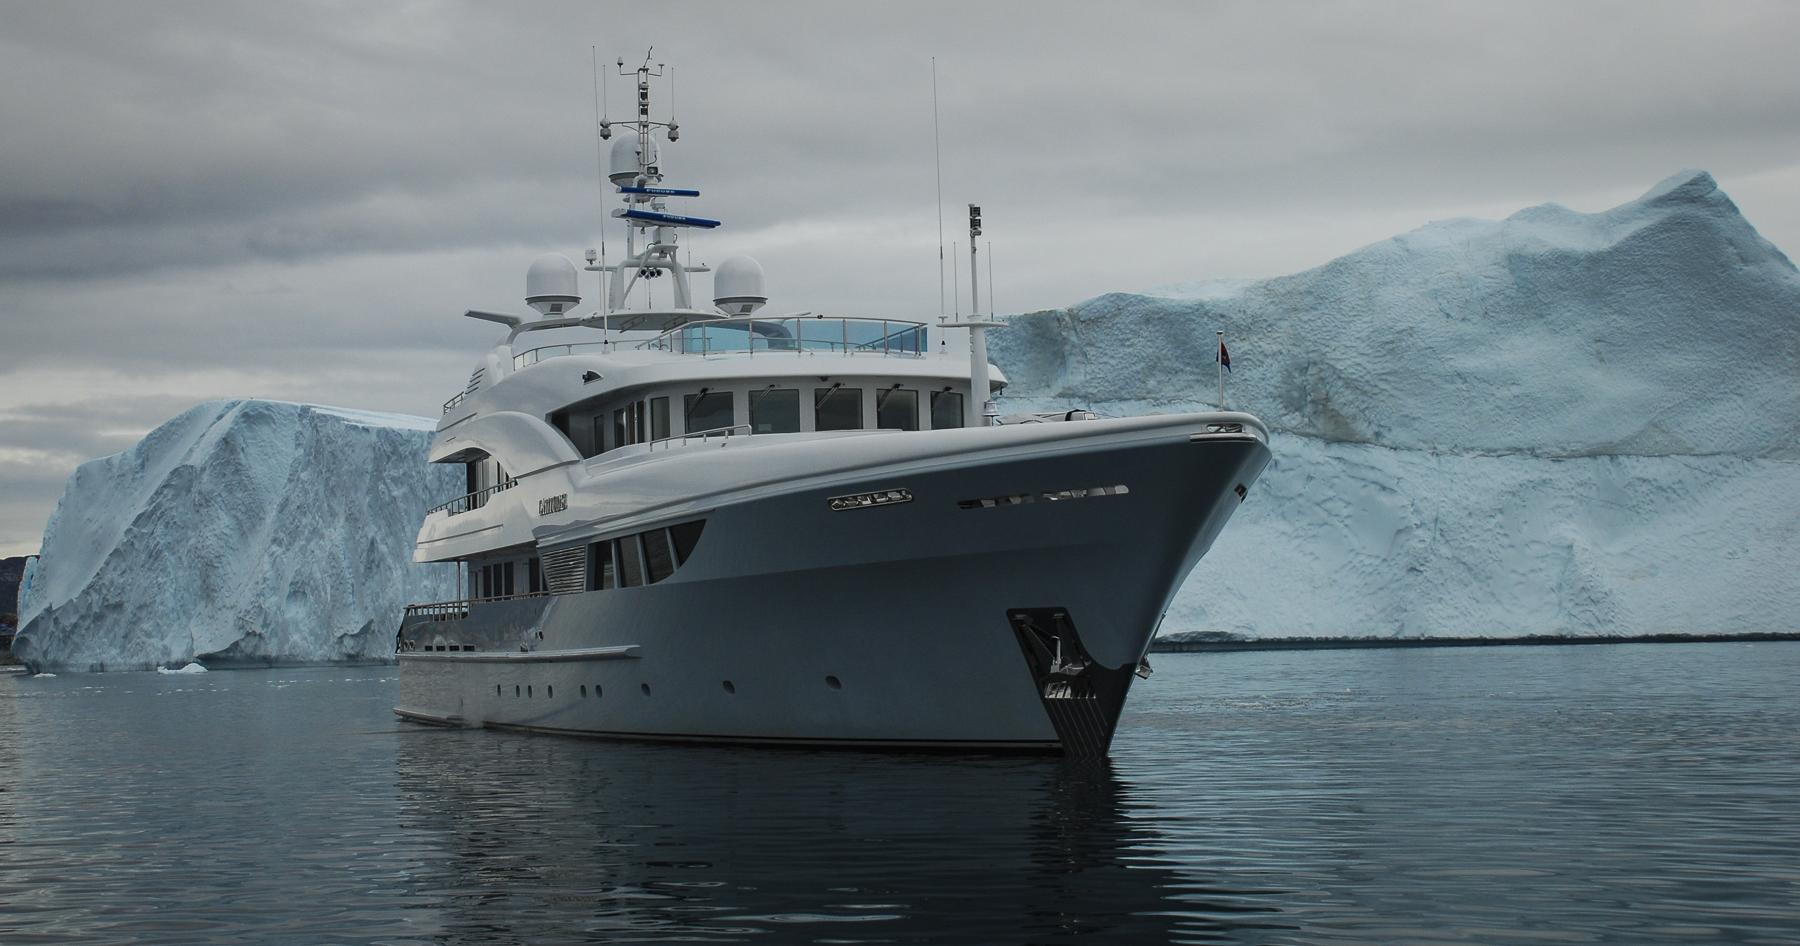 LATITUDE - The Northwest Passage & Svalbard